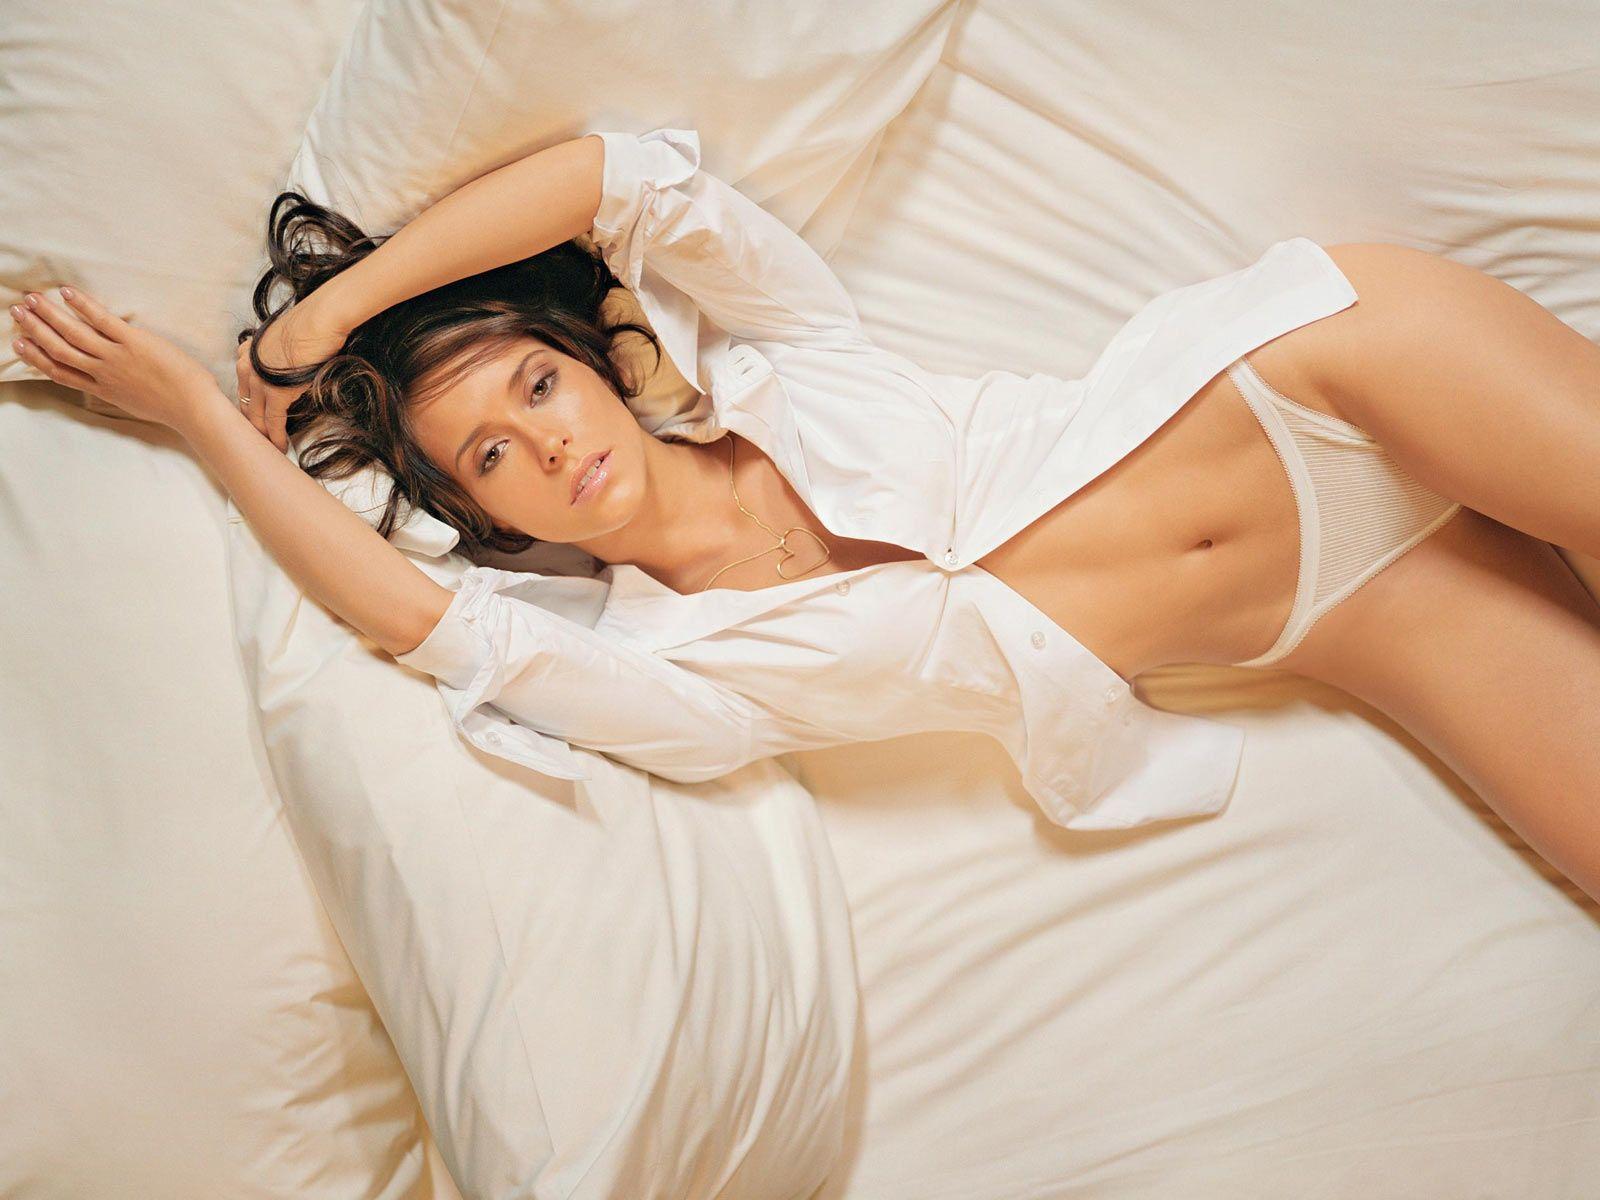 http://1.bp.blogspot.com/-ELWYn3iR3rk/UNtU9zGedNI/AAAAAAAACLU/LZpqtYvHDns/s1600/Jennifer-Love-Hewitt_10.jpg